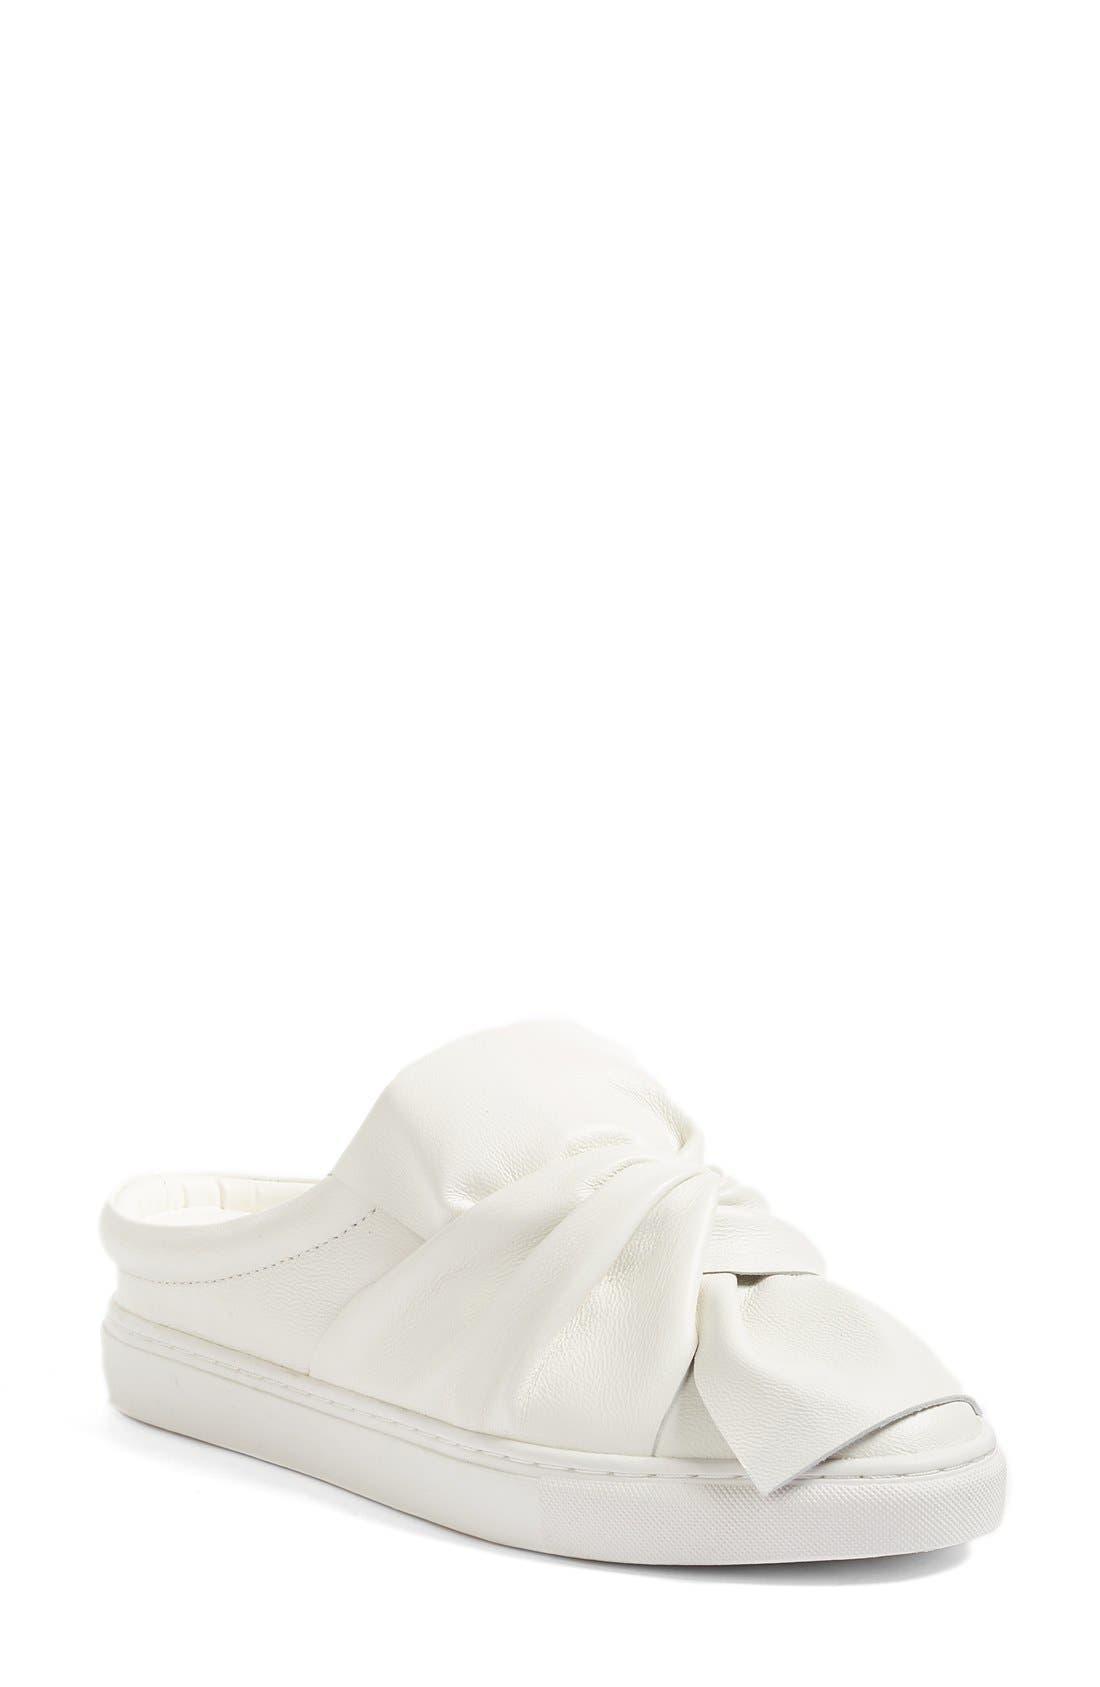 HALOGEN® Manny Knotted Slip-On Sneaker